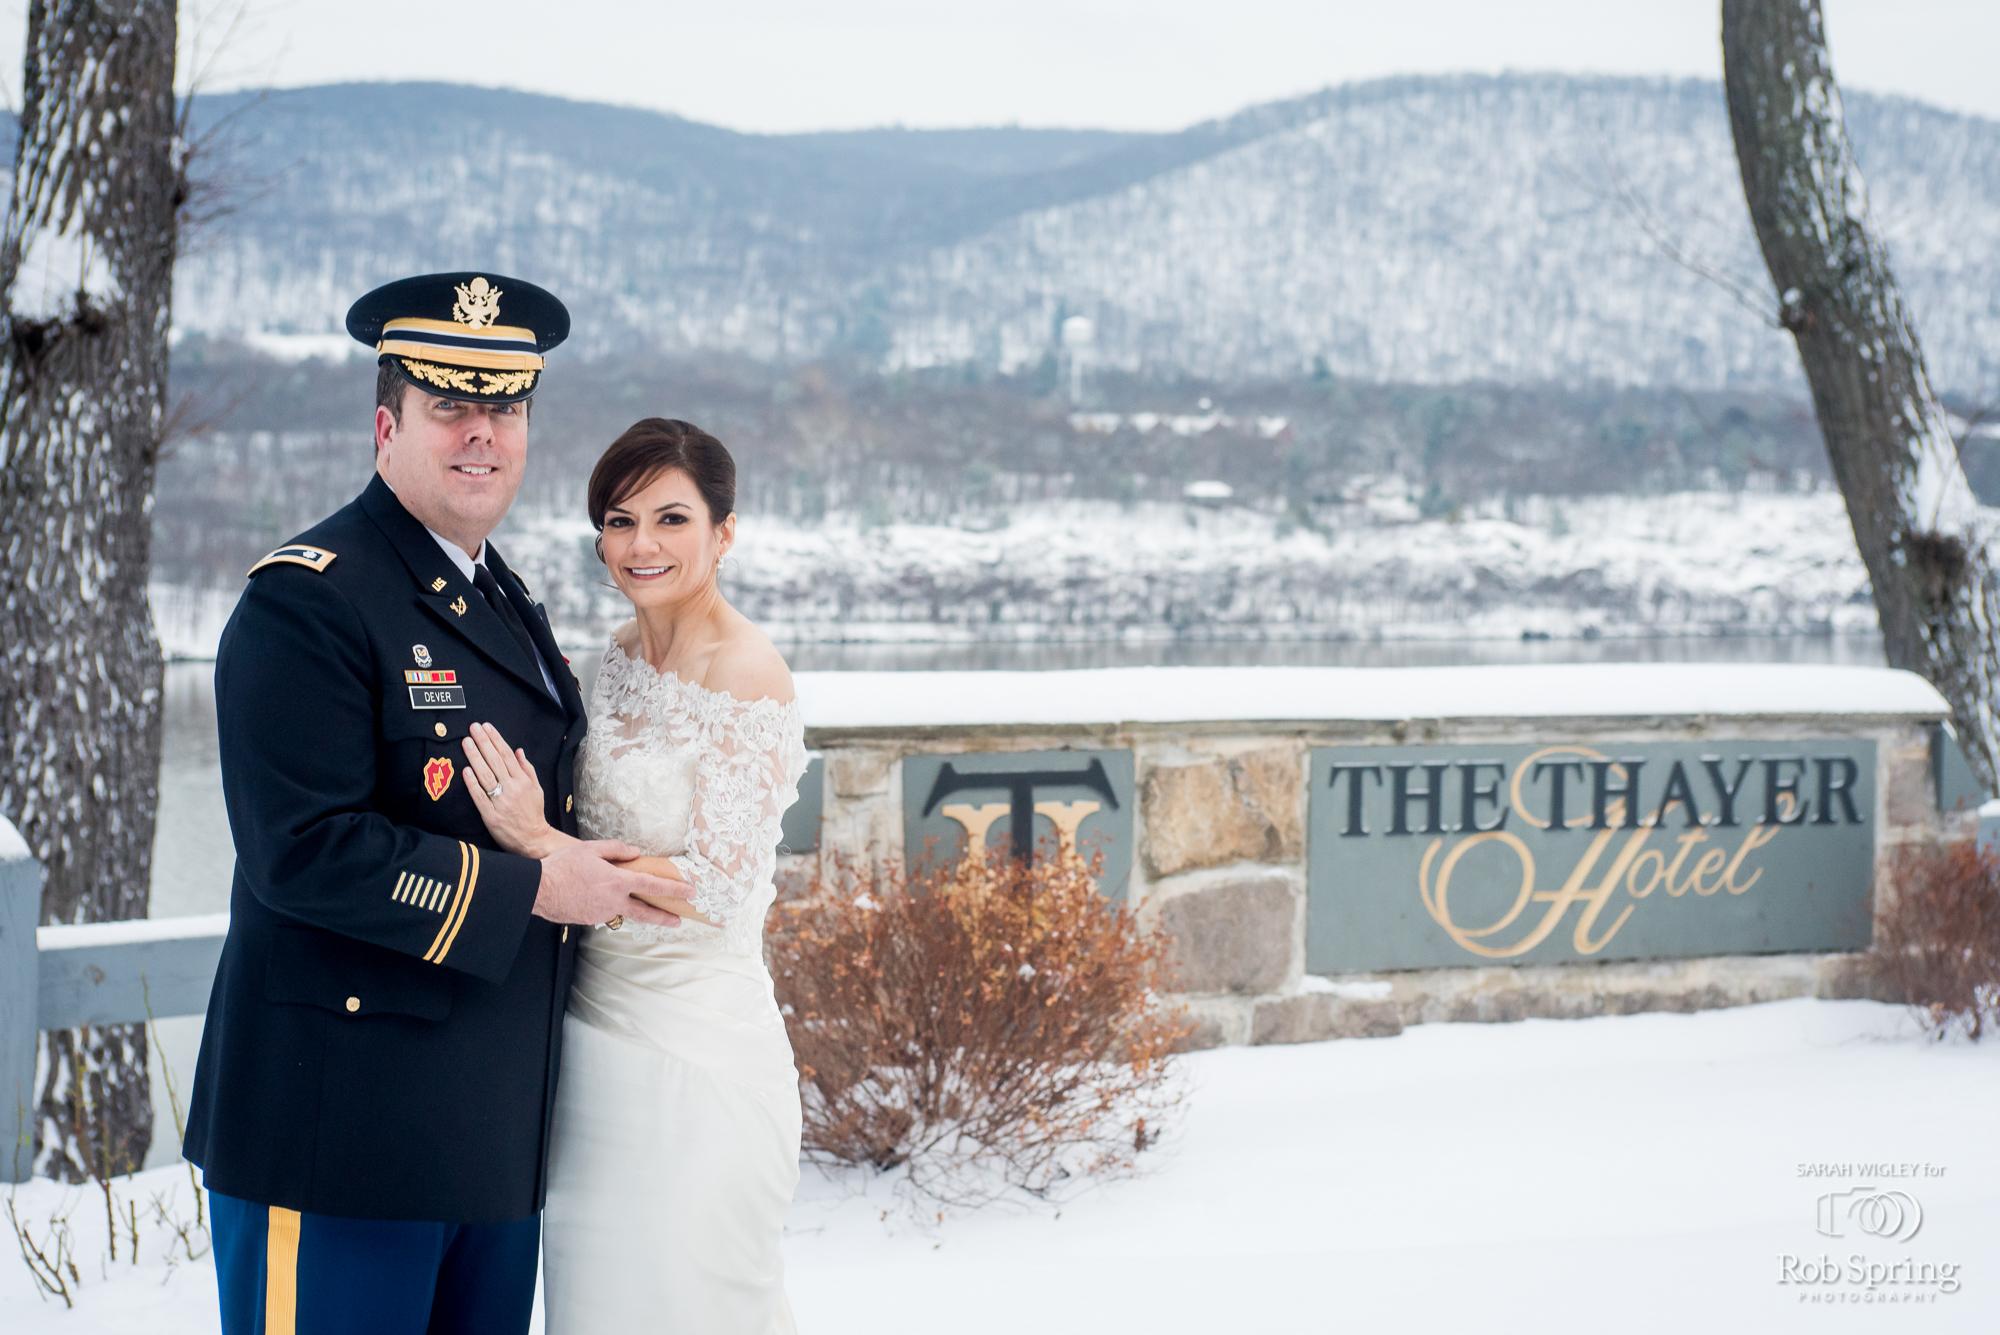 Thayer Hotel Beautiful/ Elegant Winter Wedding